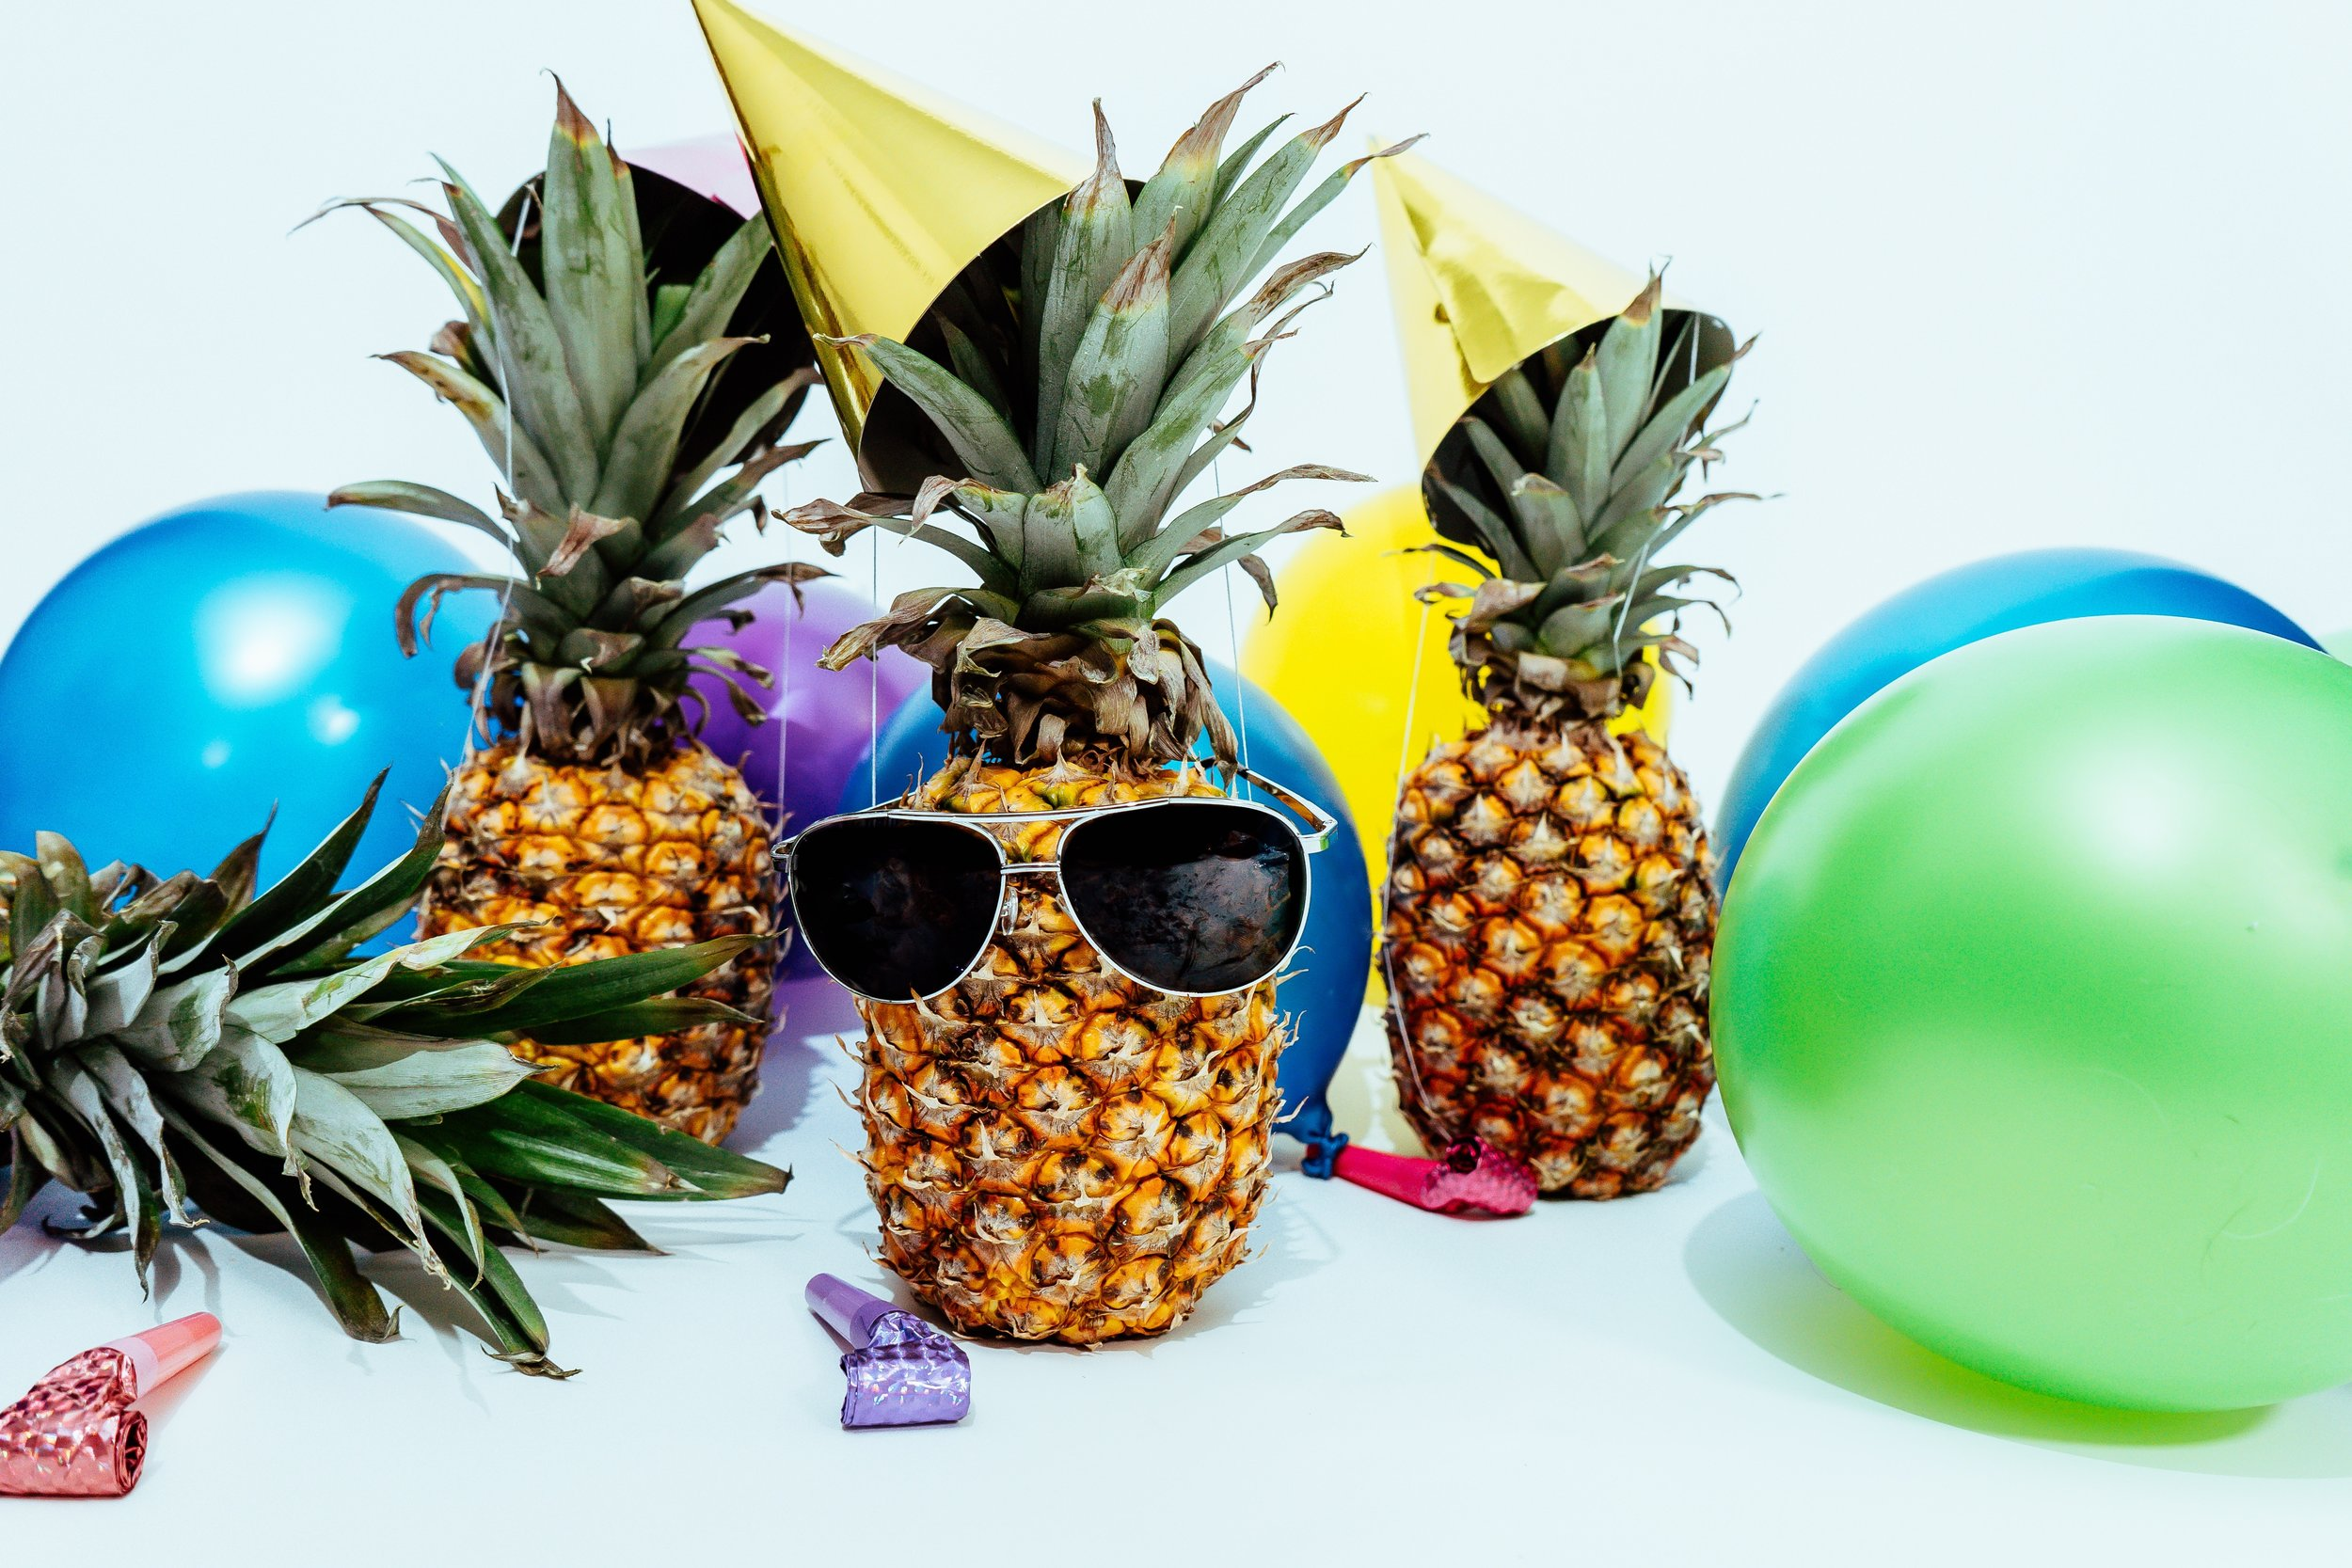 balloons-birthday-celebrate-1071882.jpg